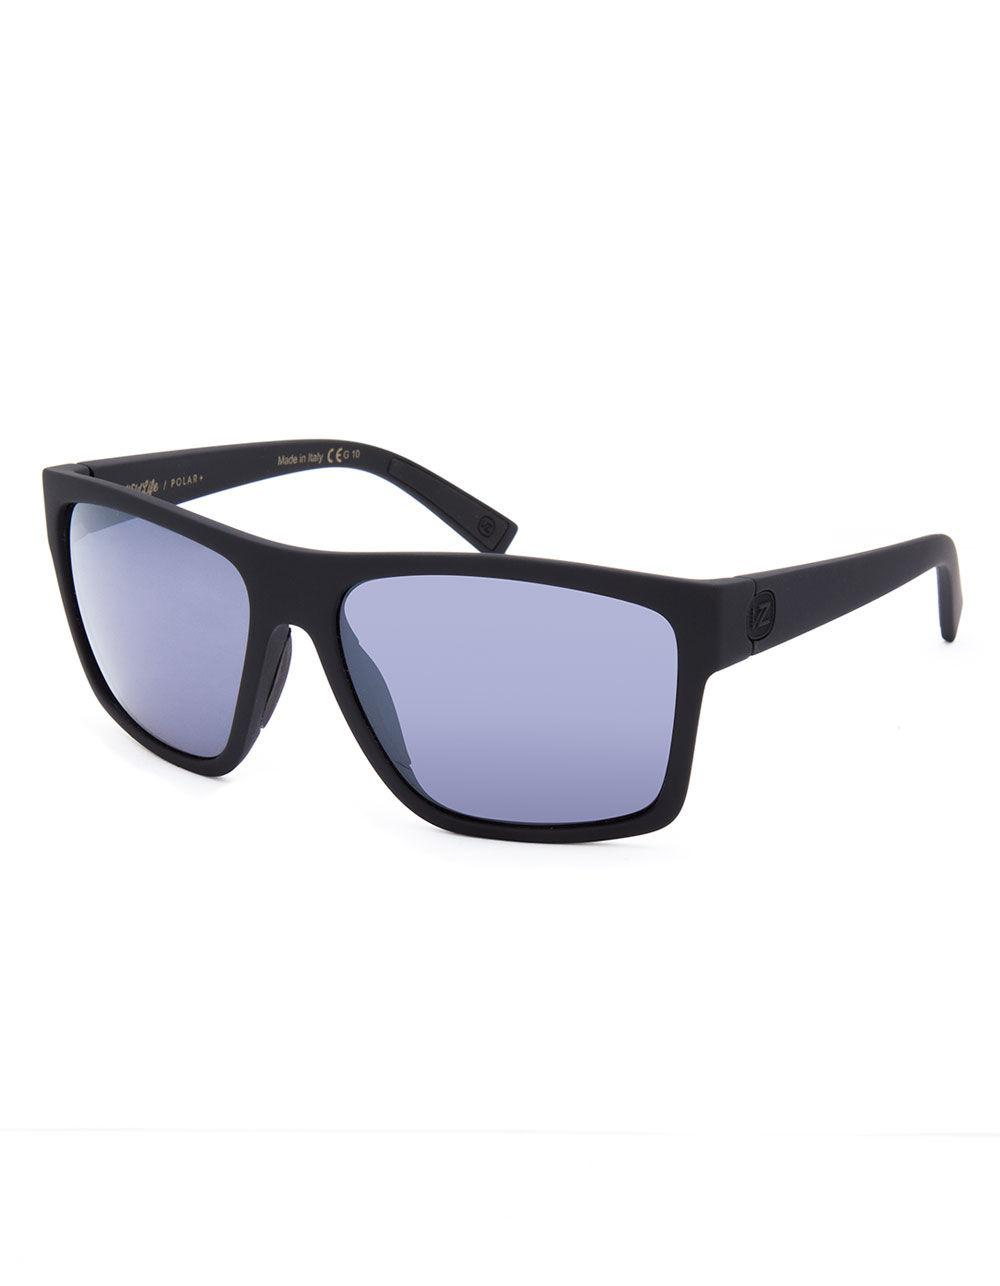 f7846510afbb Lyst - Von Zipper Dipstick Wildlife Polarized Sunglasses in Black ...